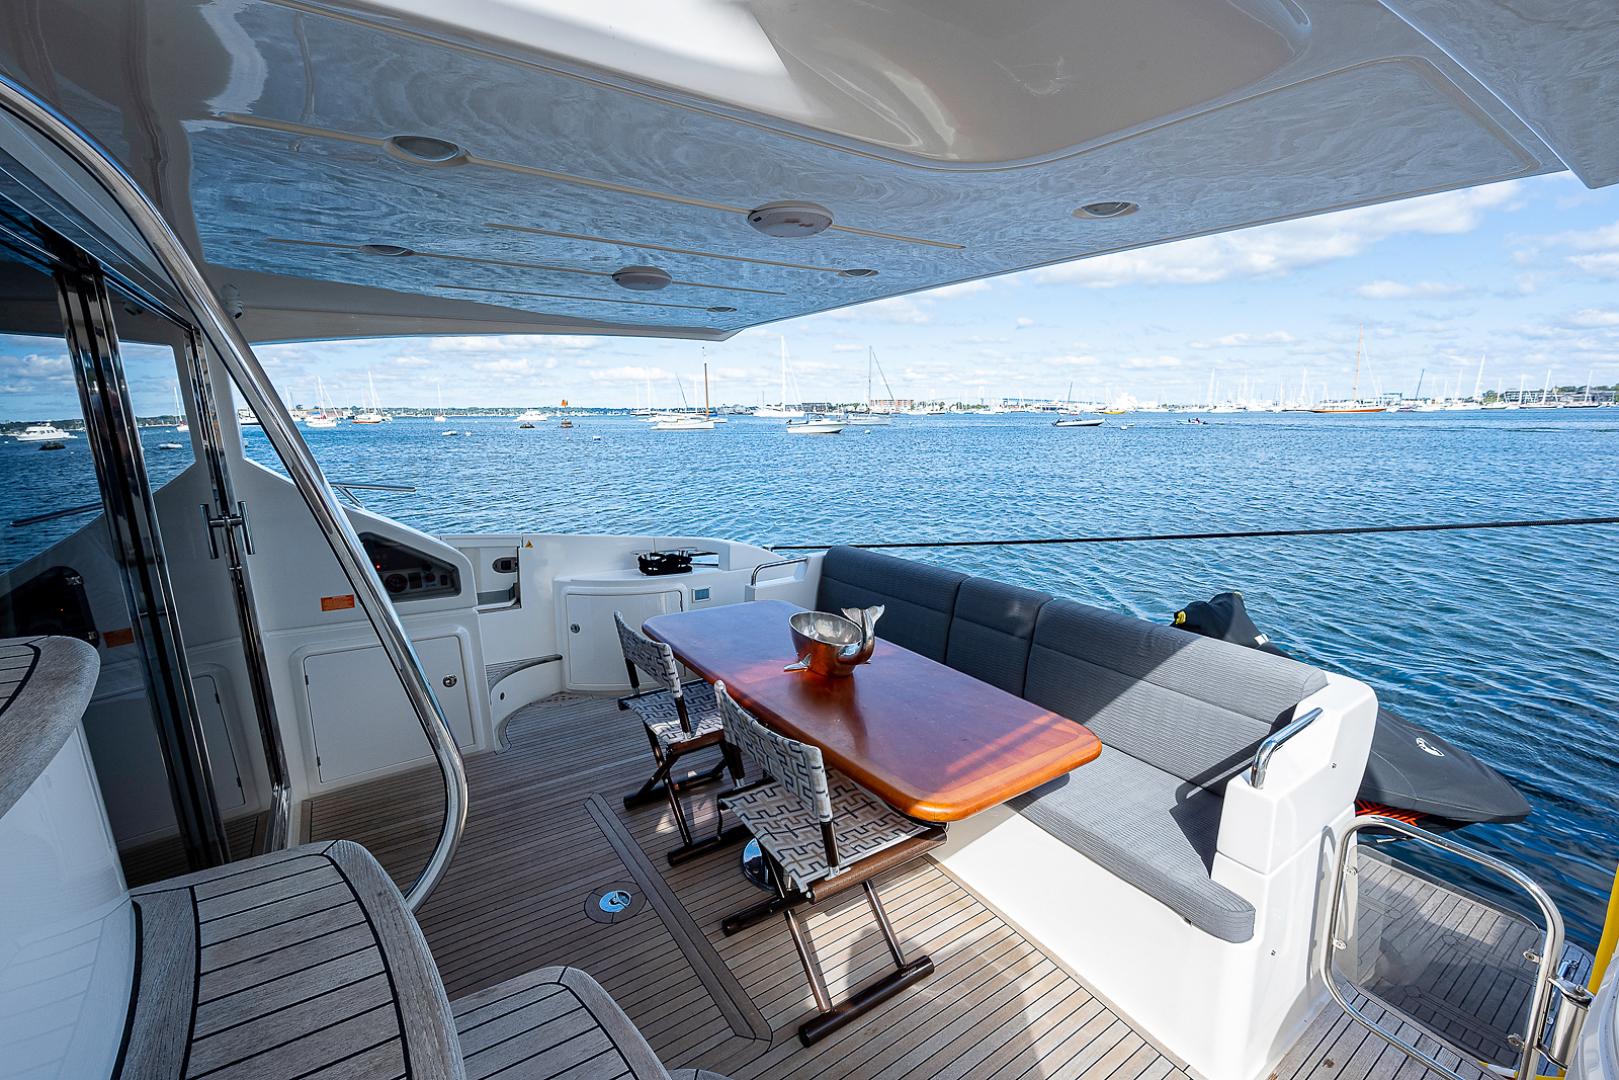 Azimut-58 Fly Motor Yacht 2011-Nova Fort Lauderdale-Florida-United States-58_azimut_nova__aft_deck15-1490486 | Thumbnail